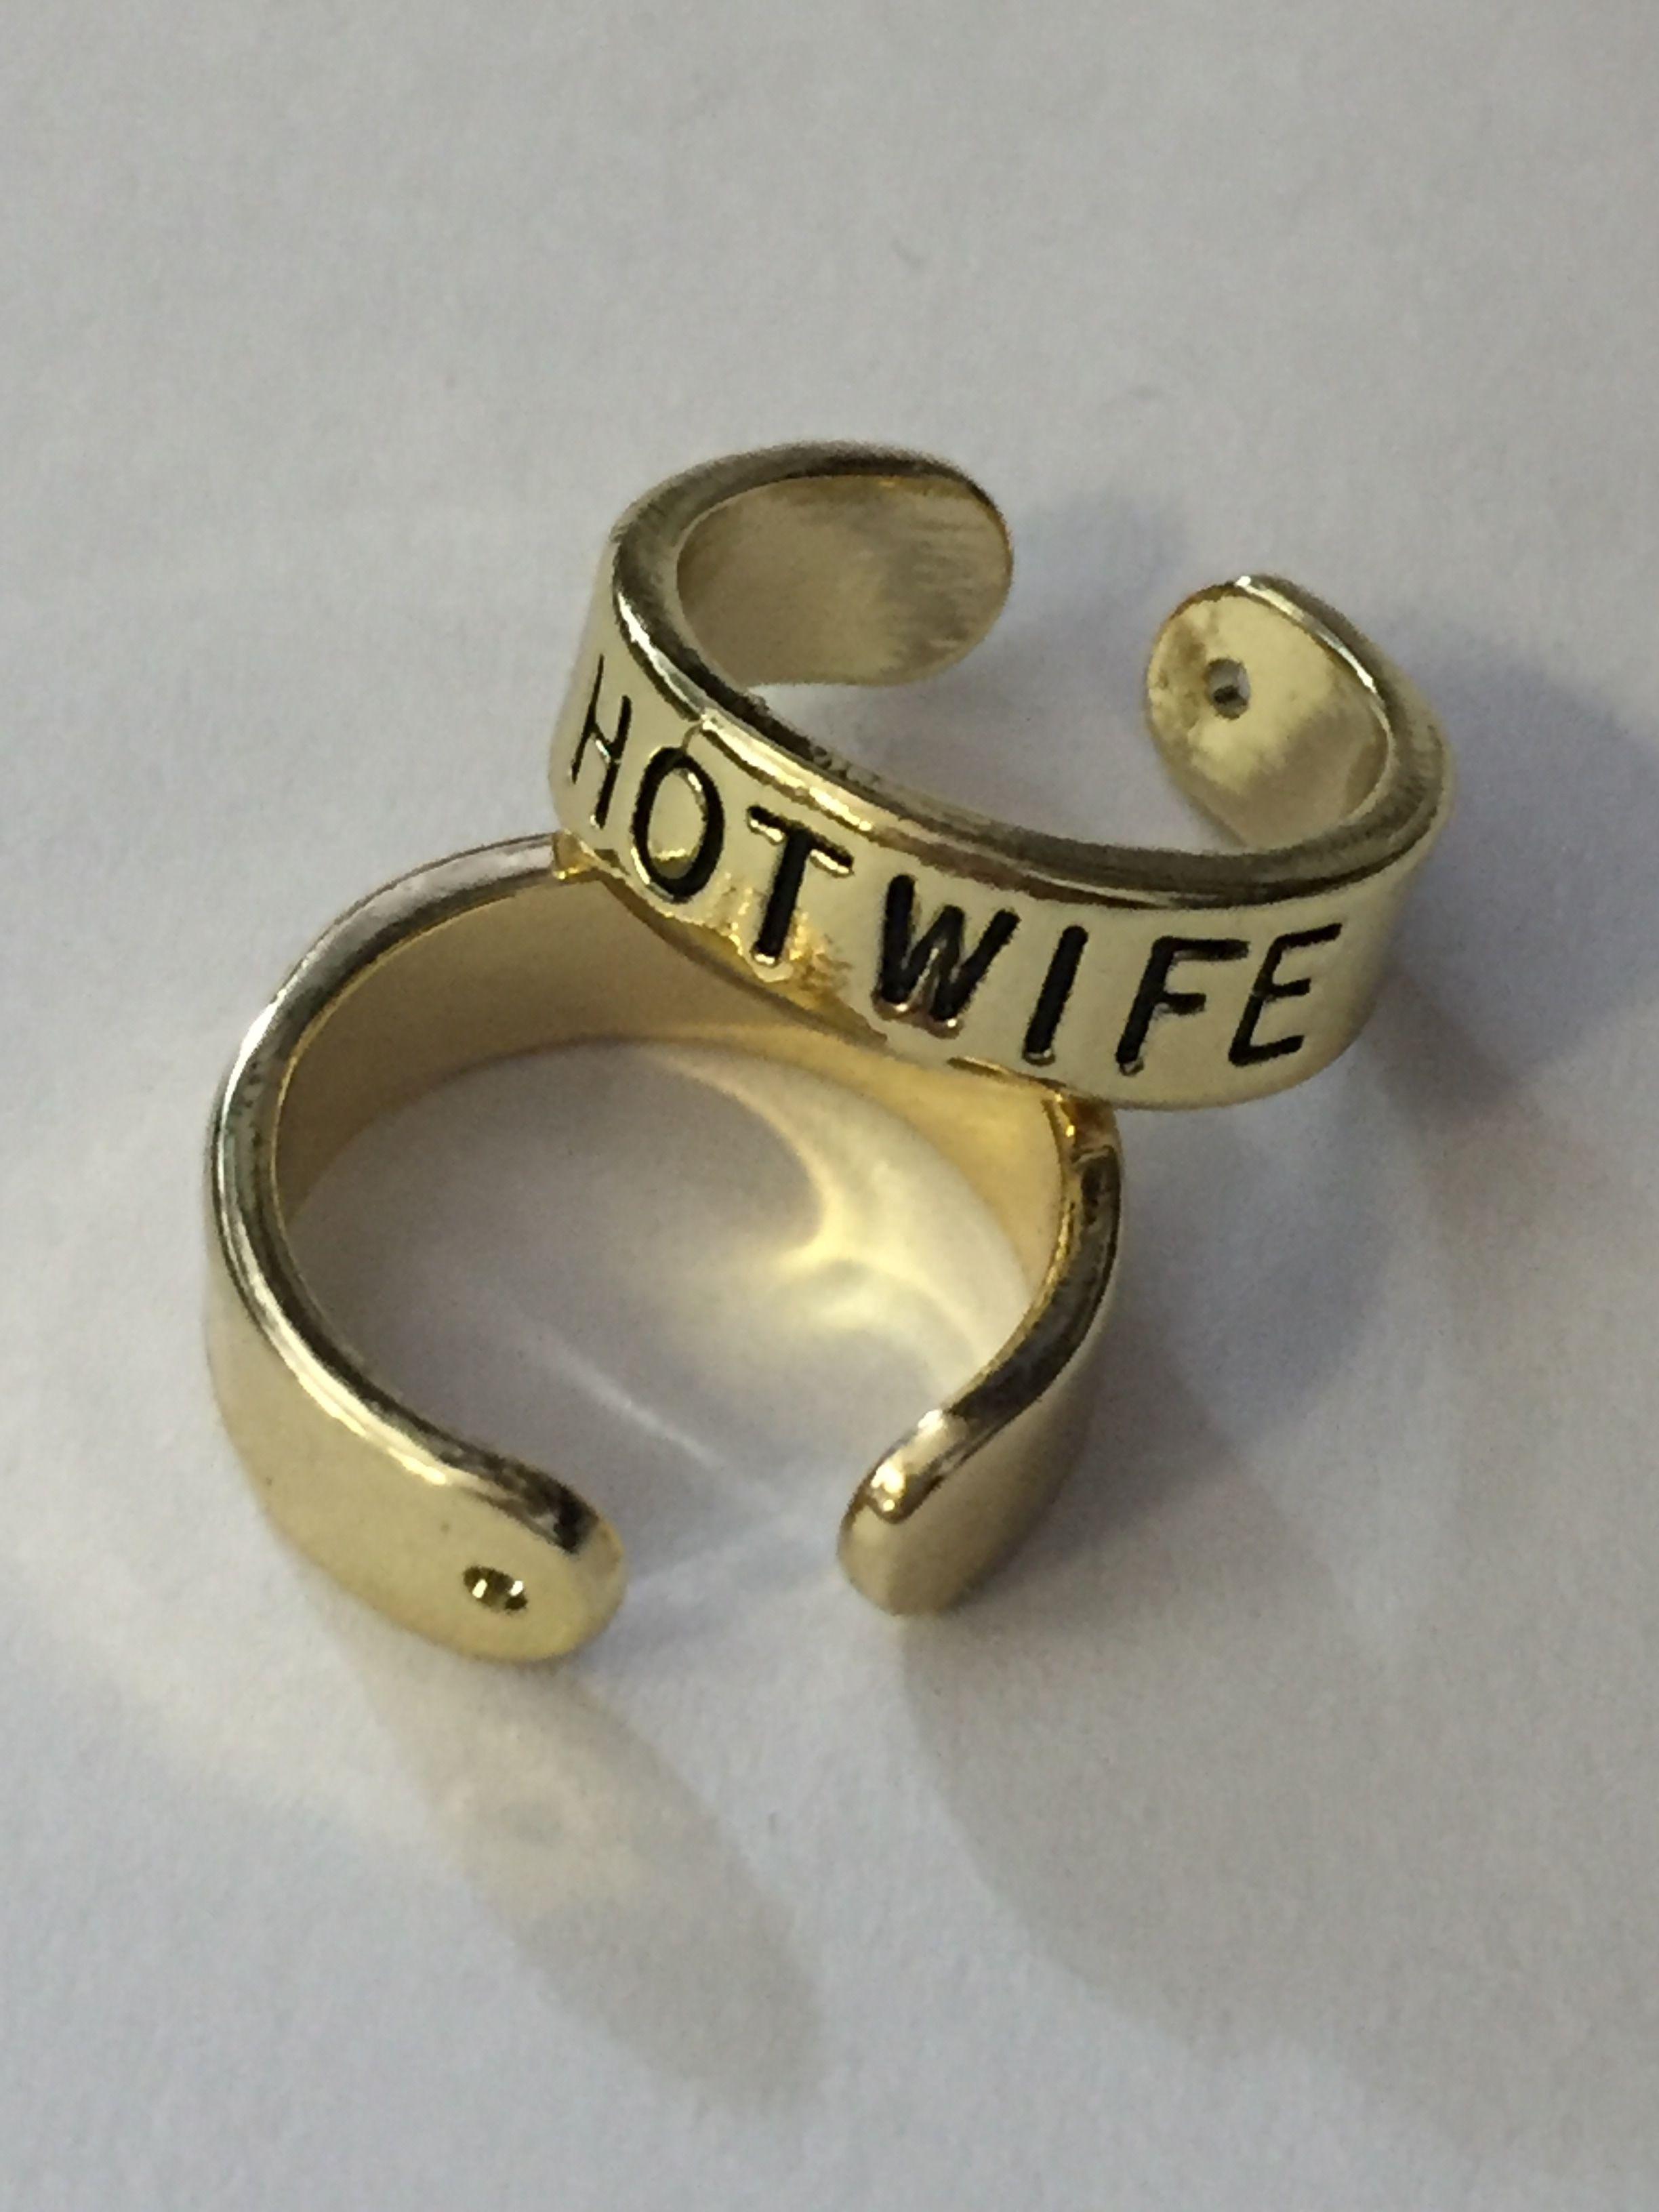 Gold Slut Whore BBC Hotwife or QOS Toe Ring Swinger Jewelry